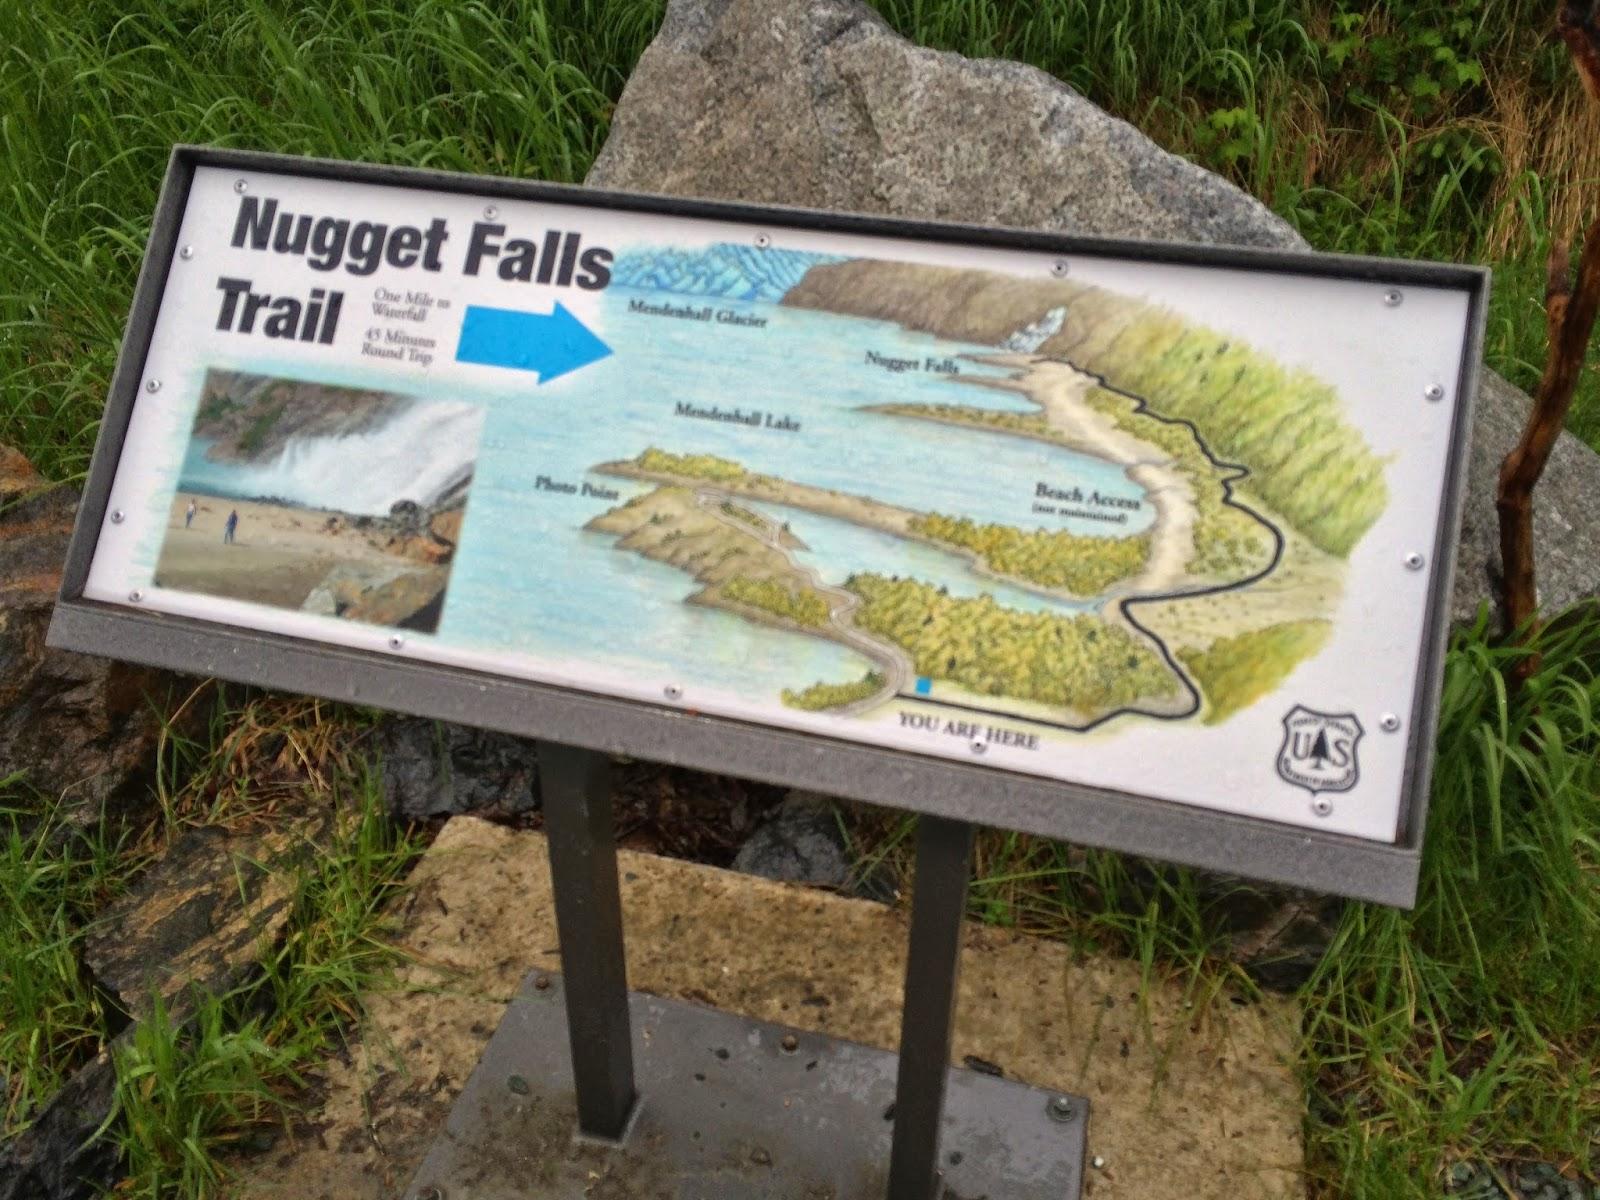 Nuget Falls Trail